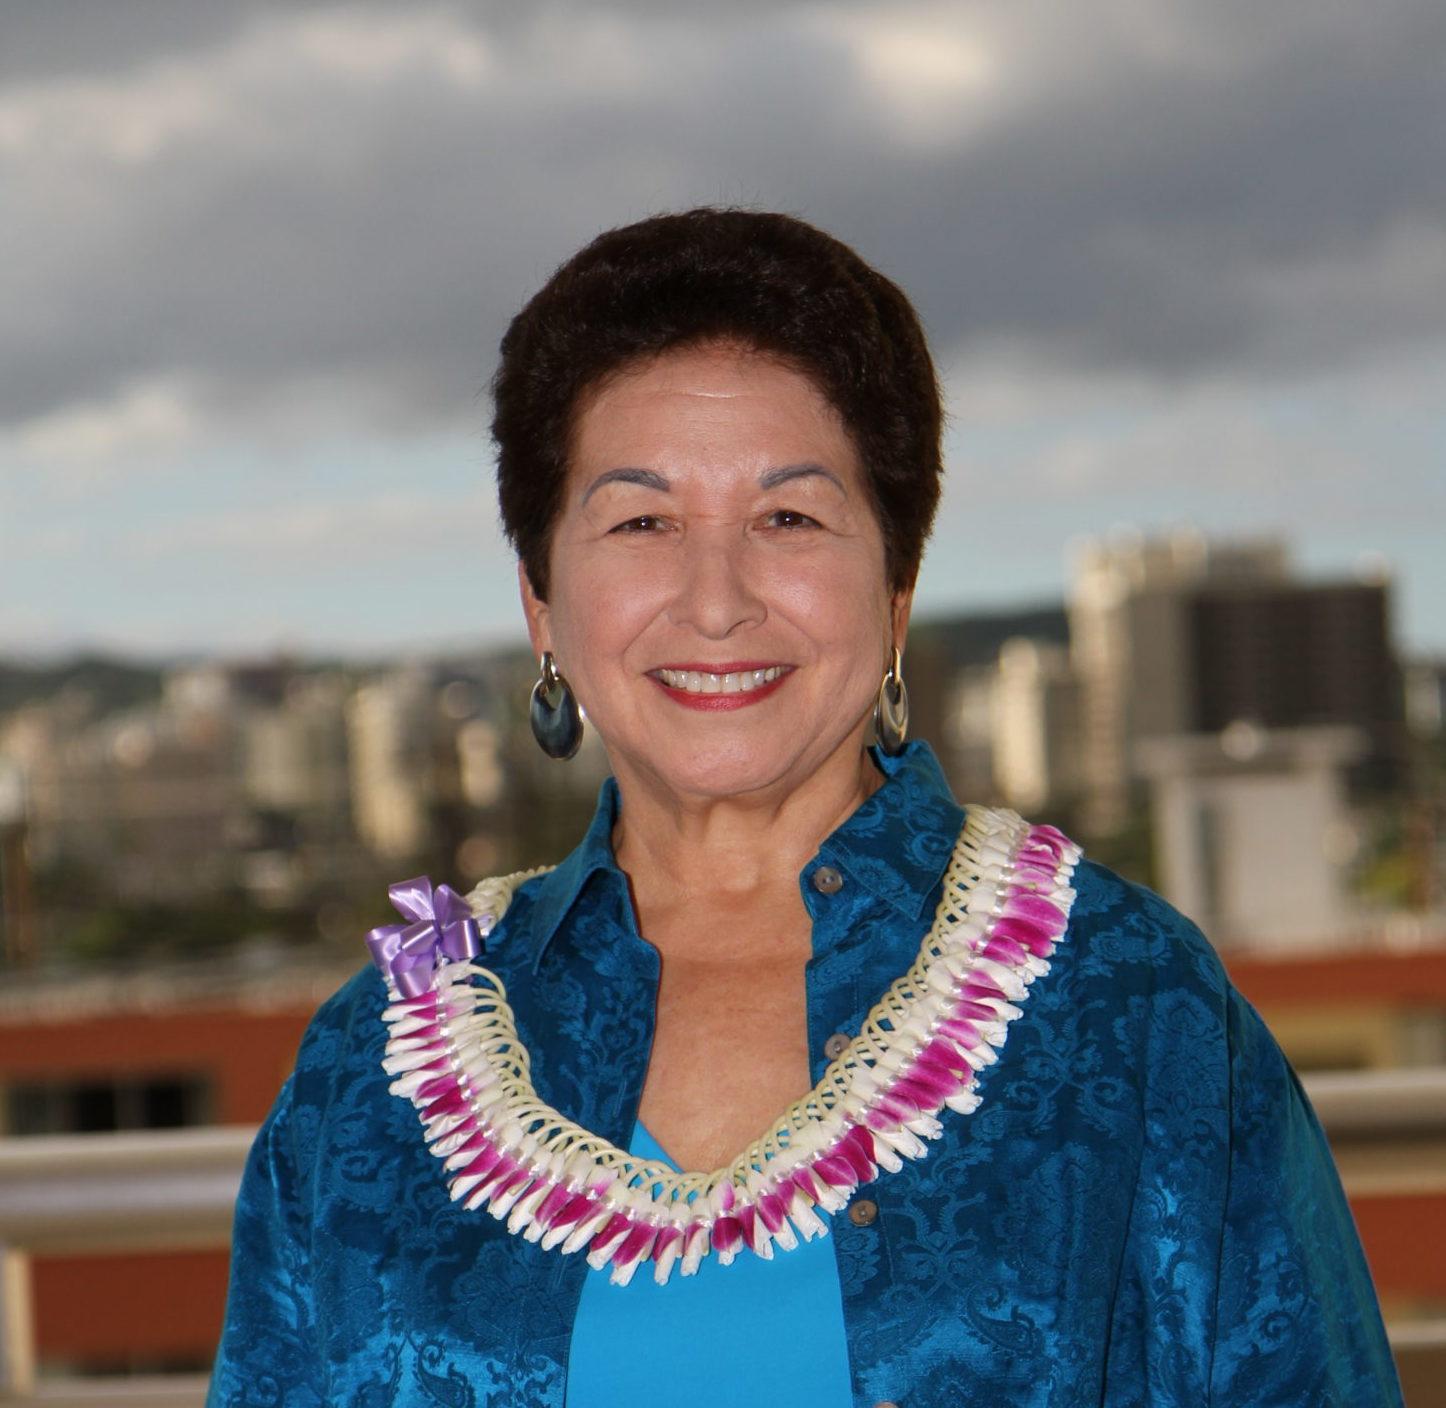 Roberta Mayor